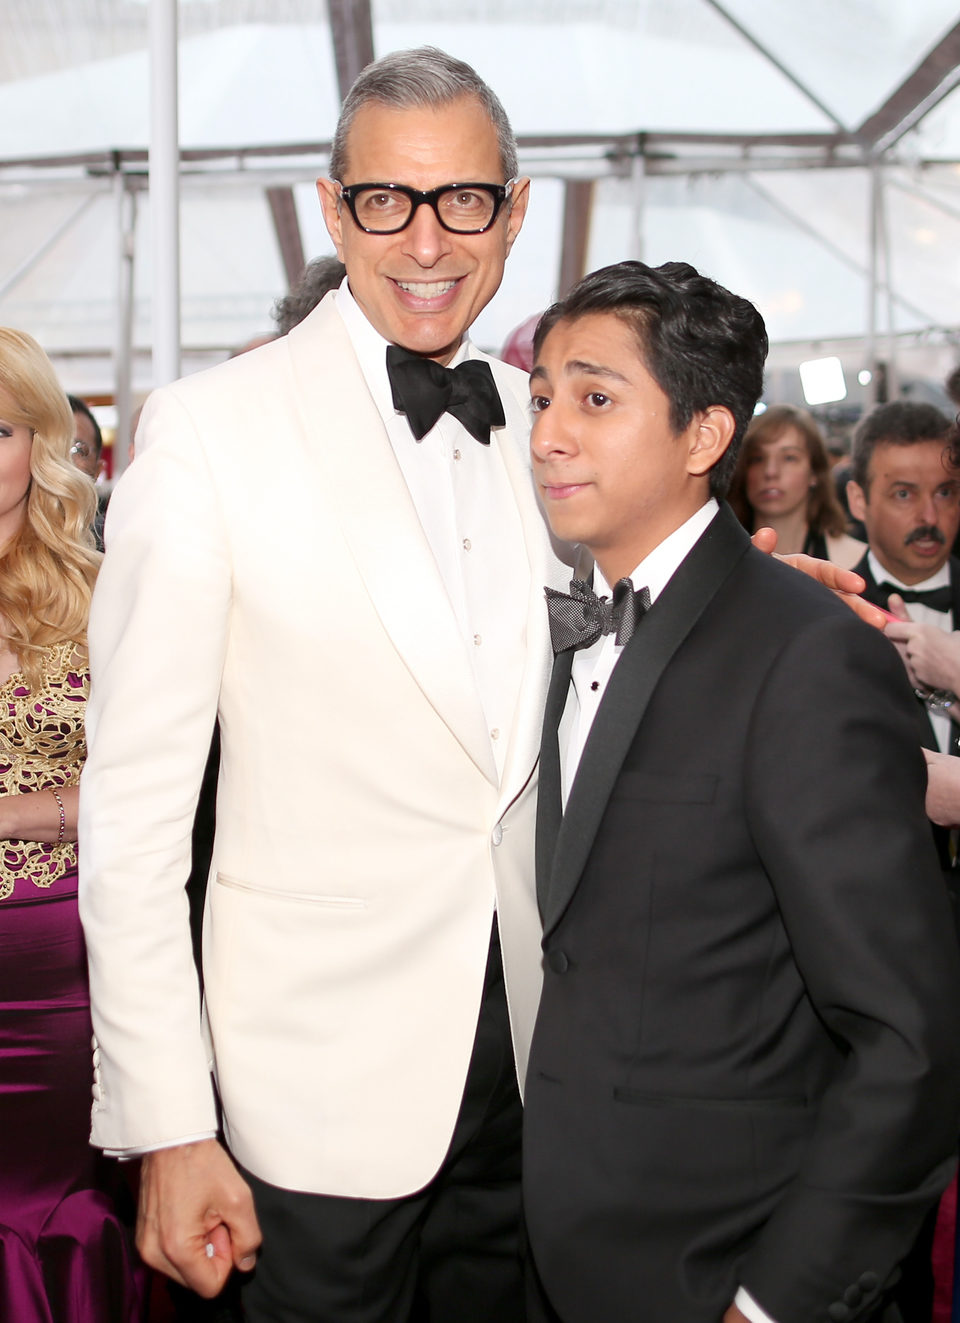 Jeff Goldblum y Tony Revolori poss in the Oscar 2015 red carpet